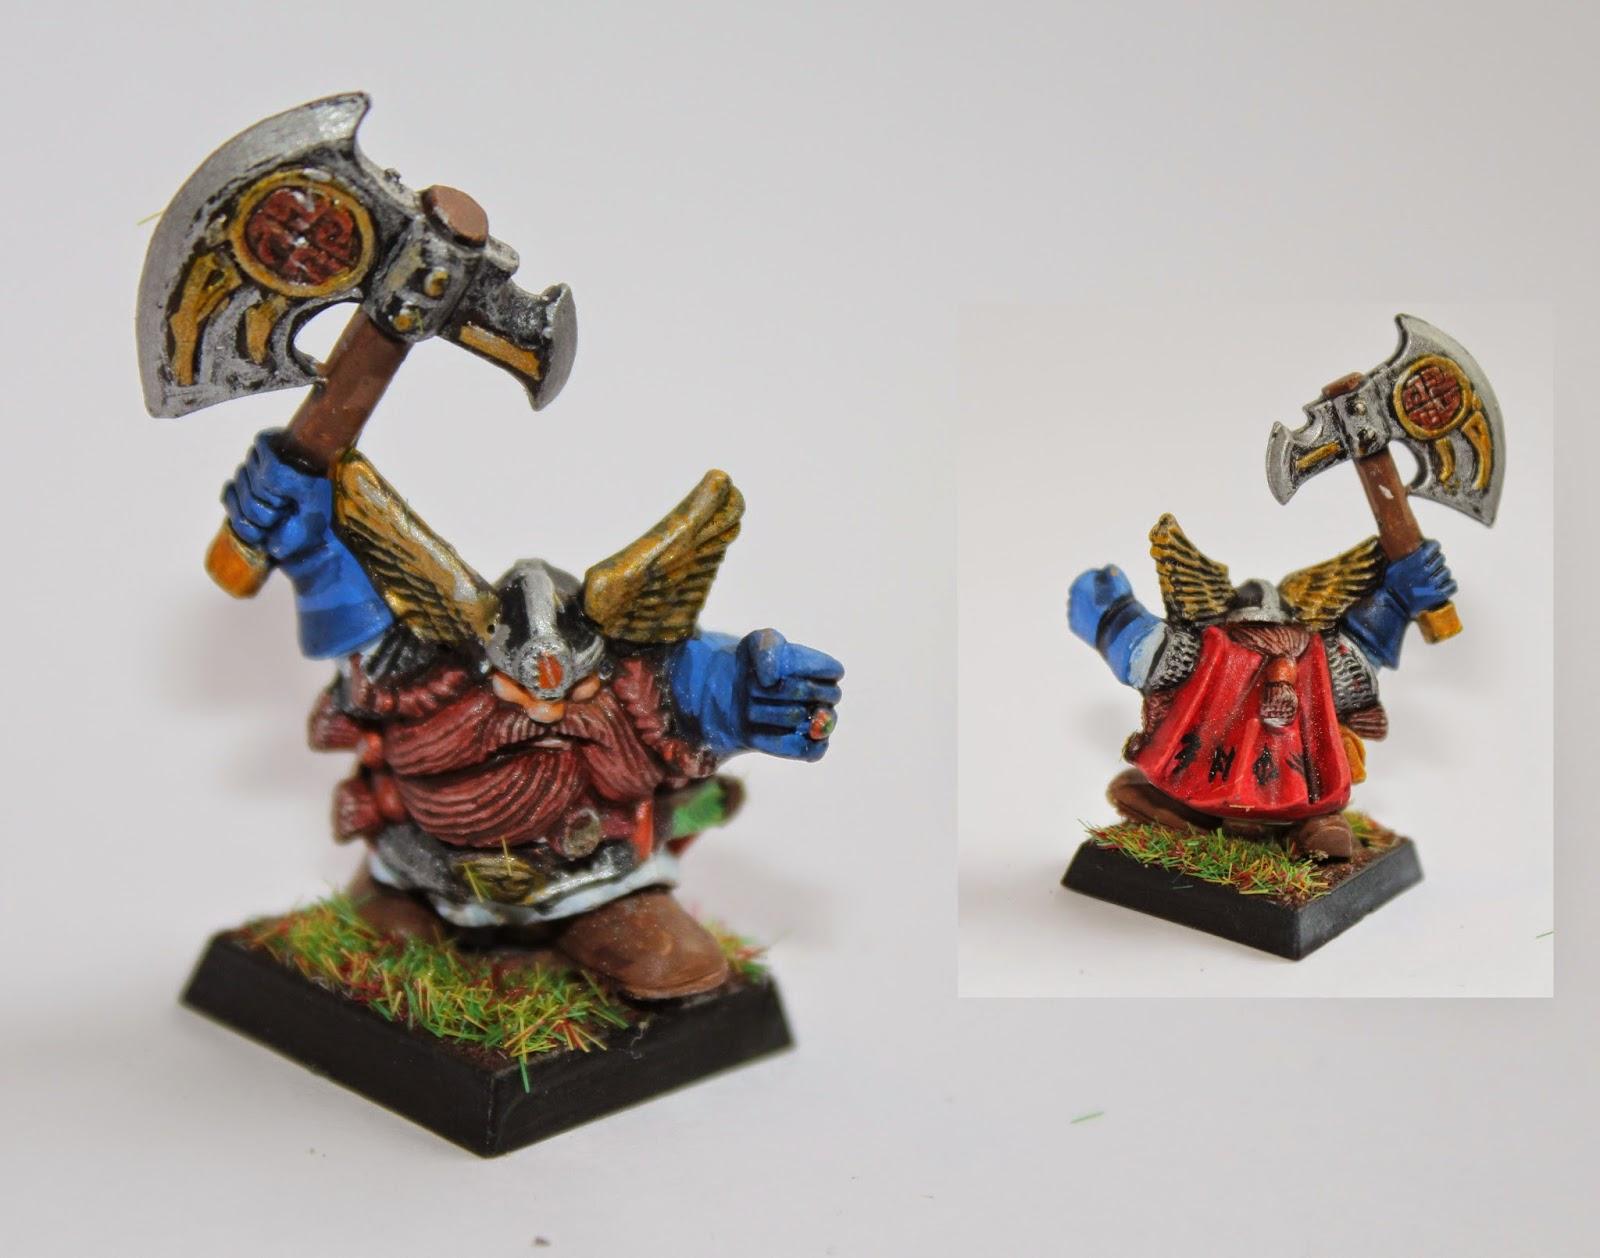 Warhammer Dwarf Hero painted